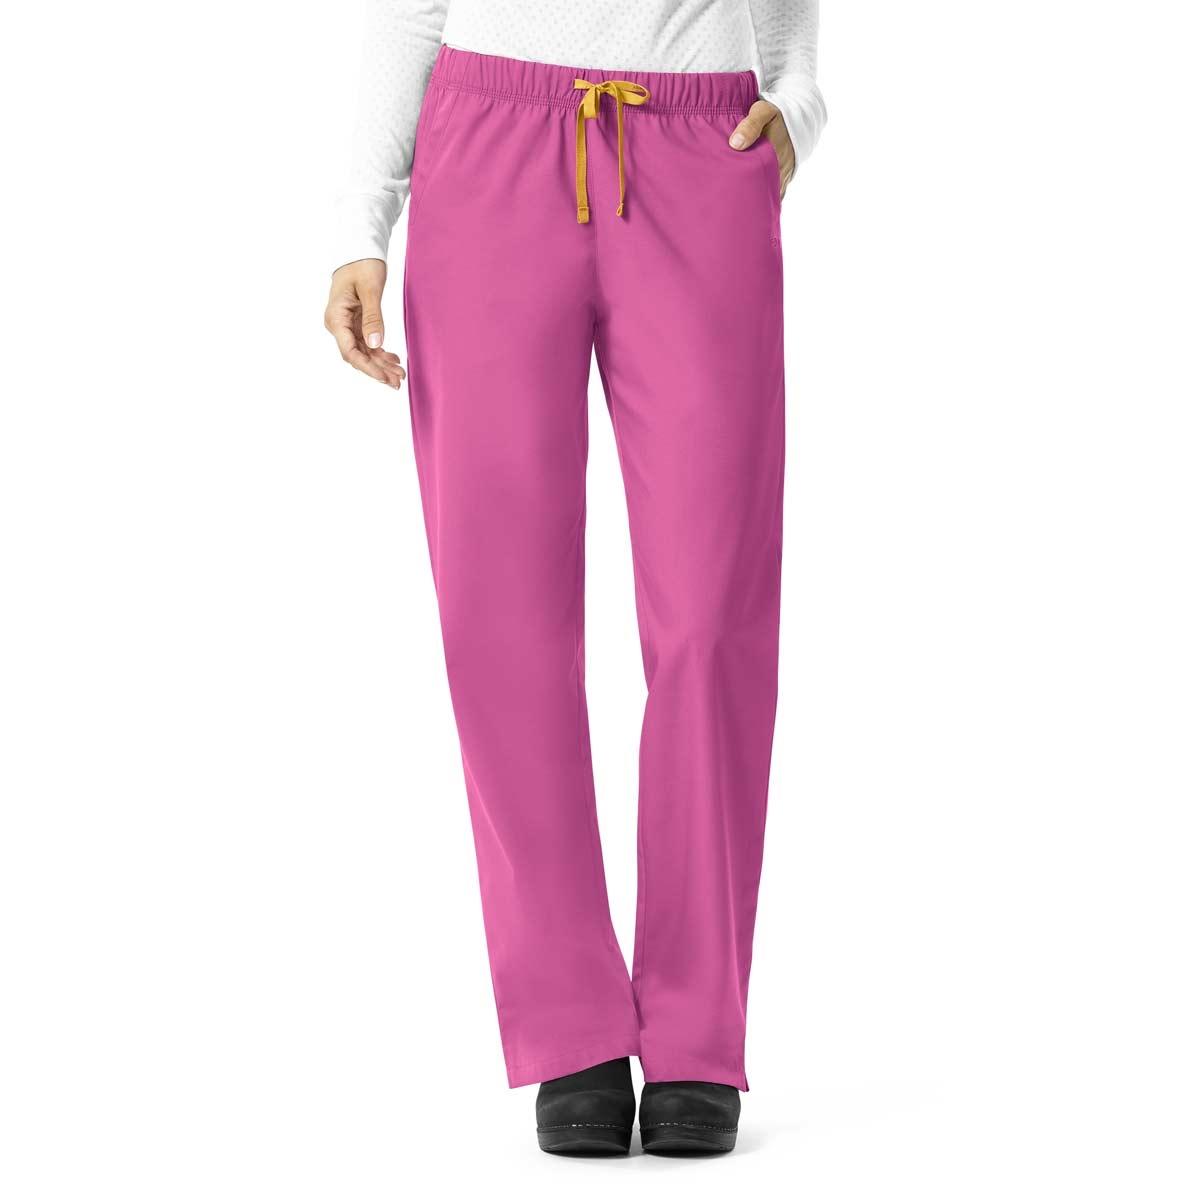 6420de9f048 Carhartt Rockwall Women s Pull On Straight Leg Pant · View Larger Photo